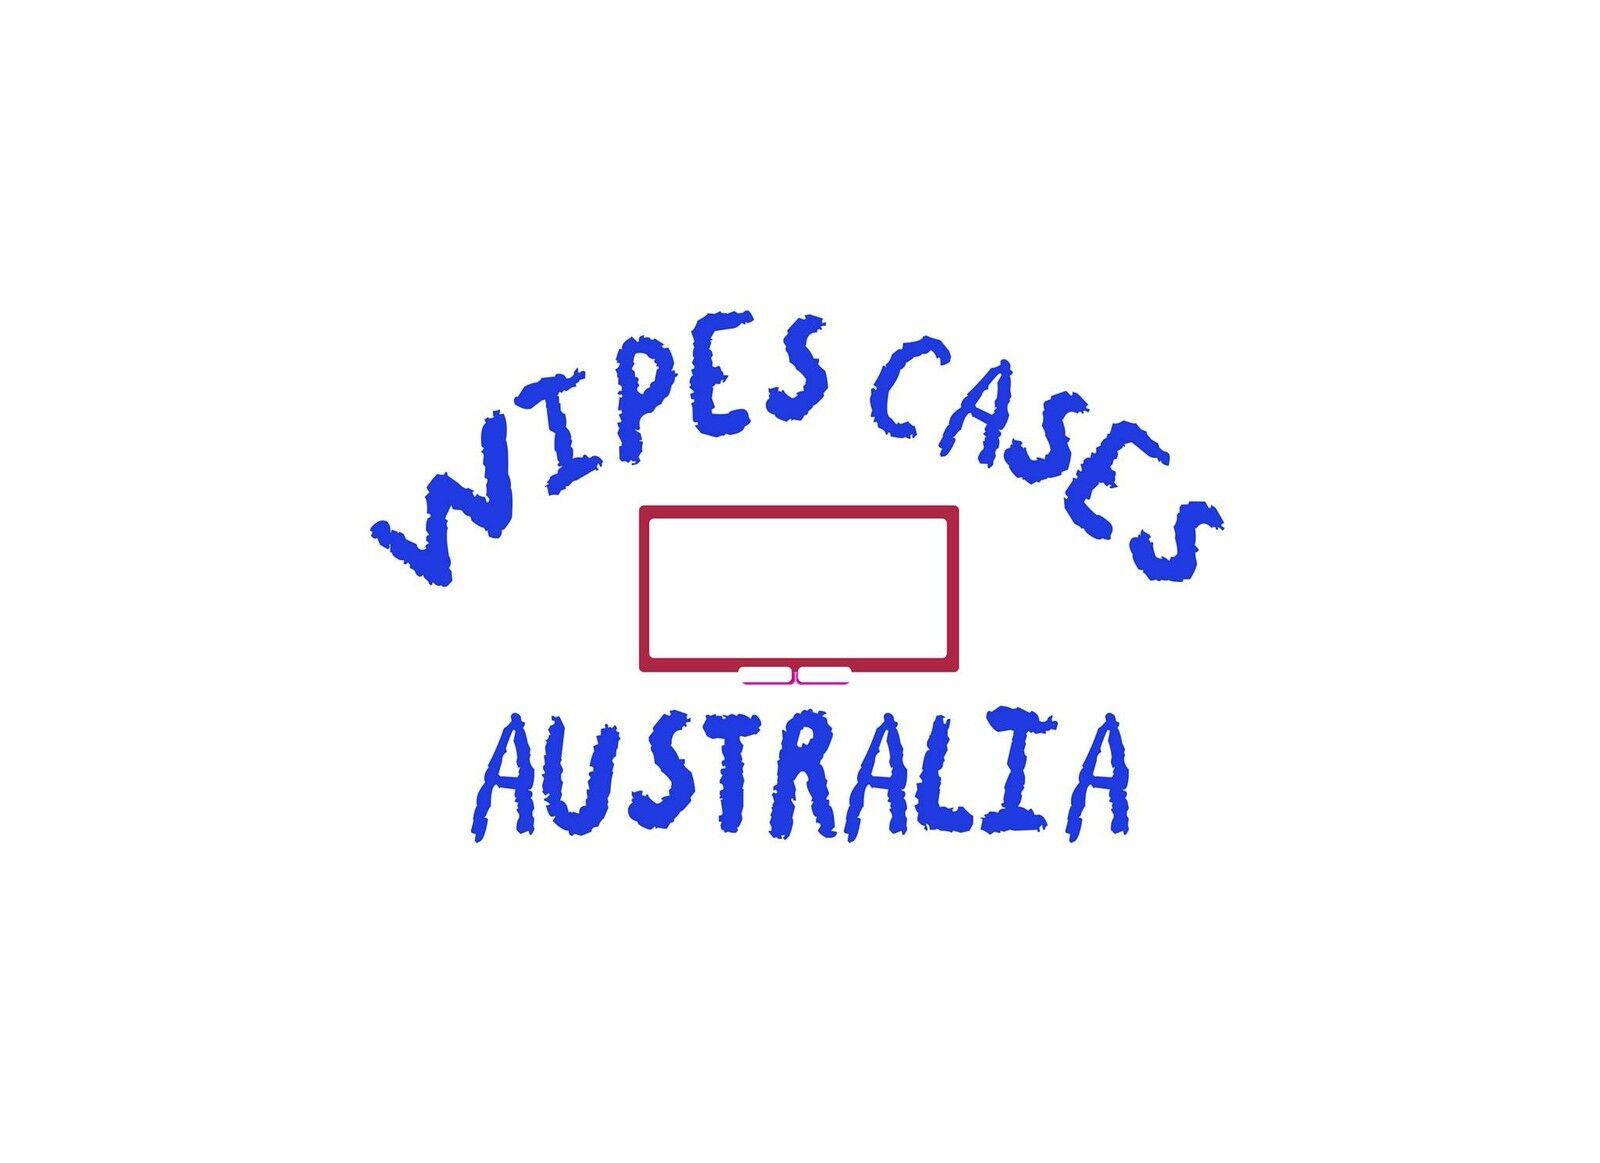 Wipes Cases Australia